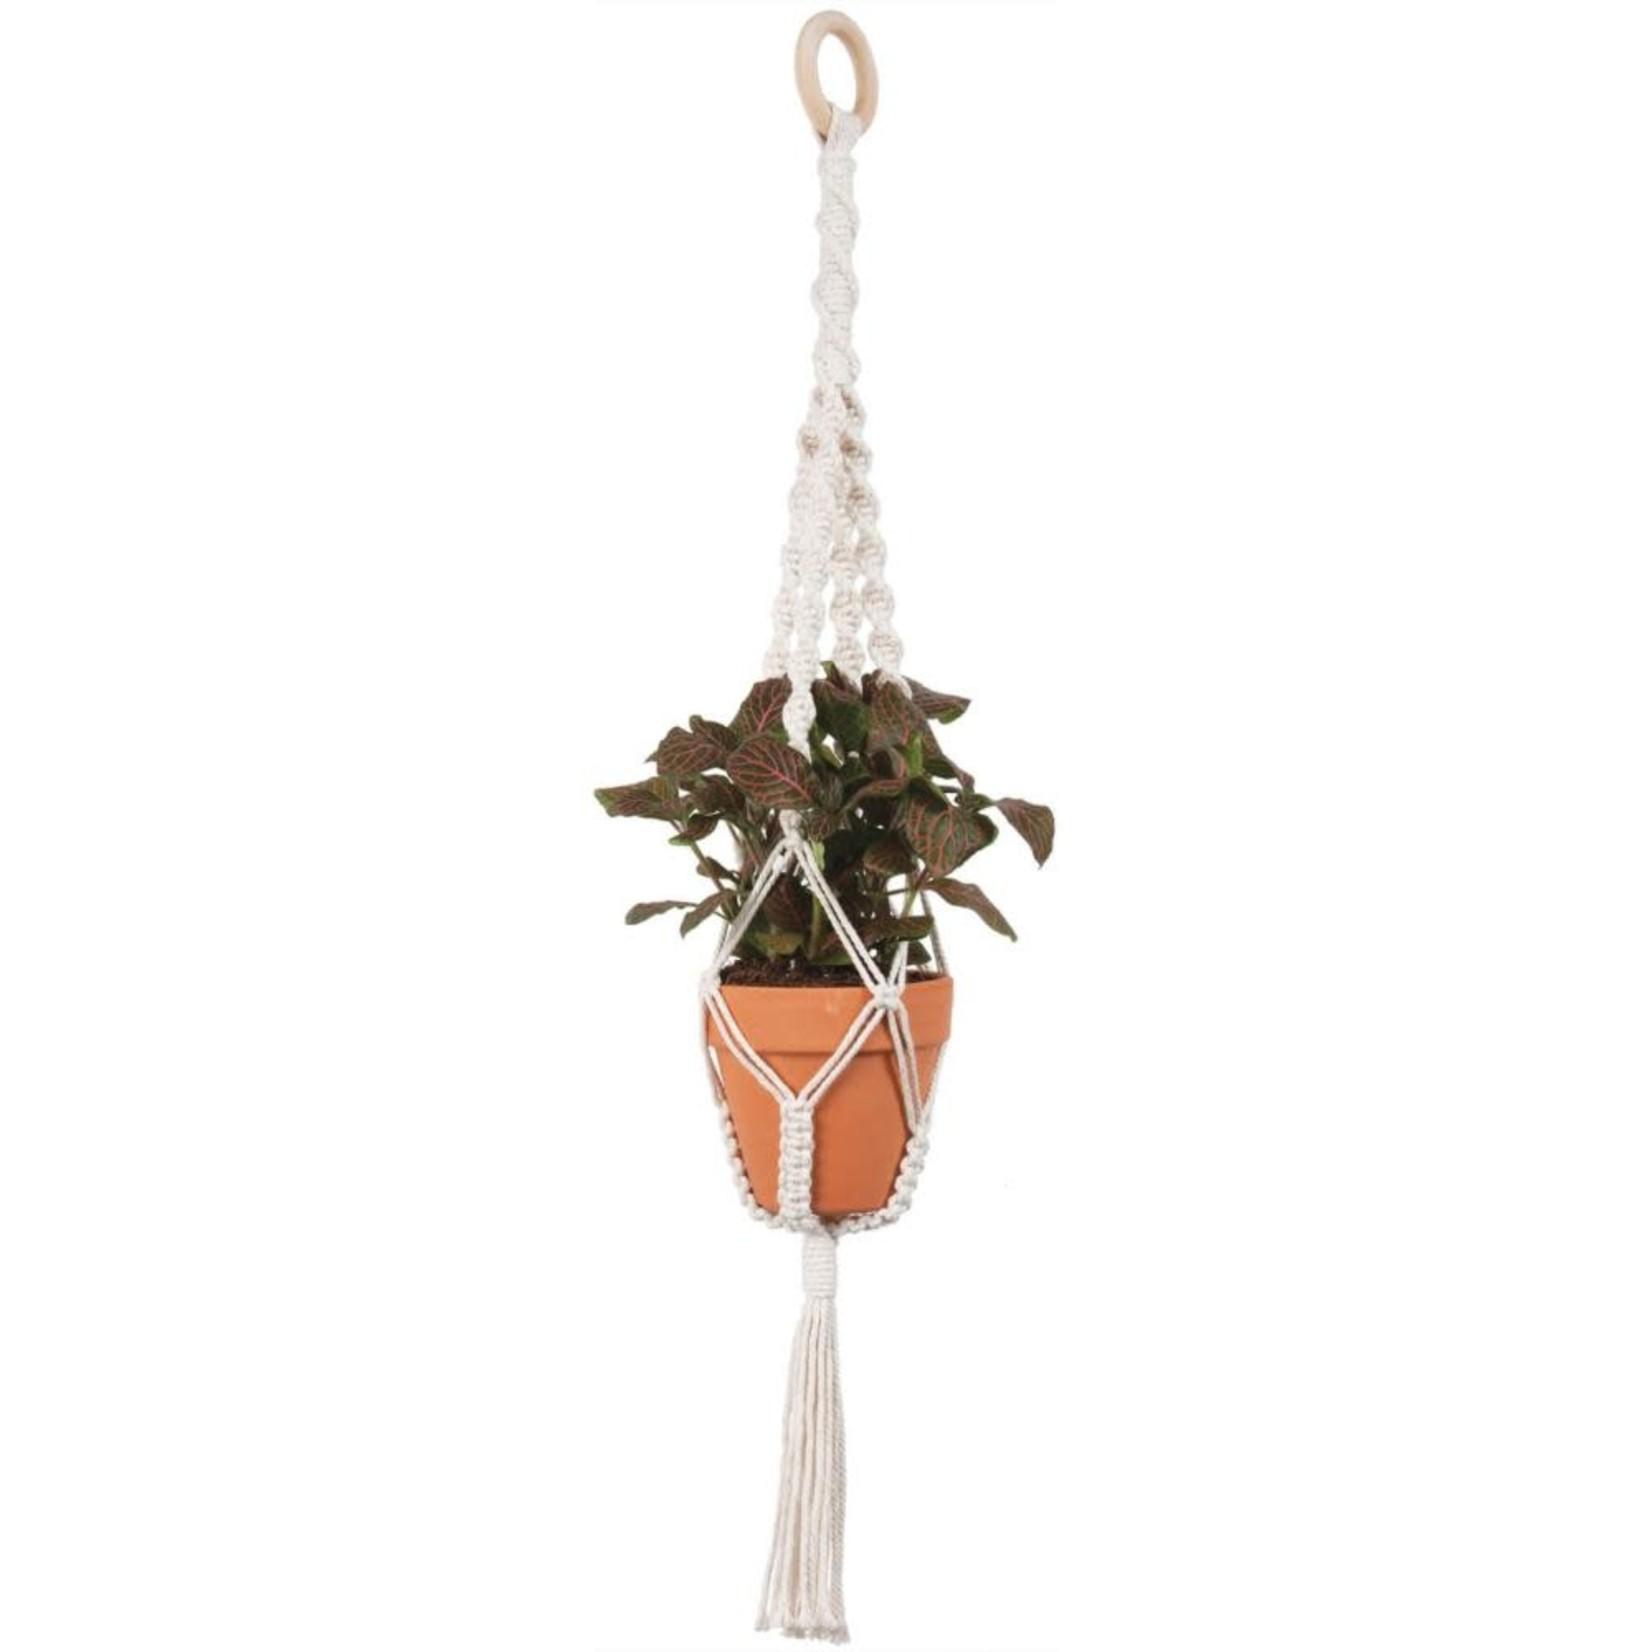 Macrame Plant Hanger Kit-4 Twists